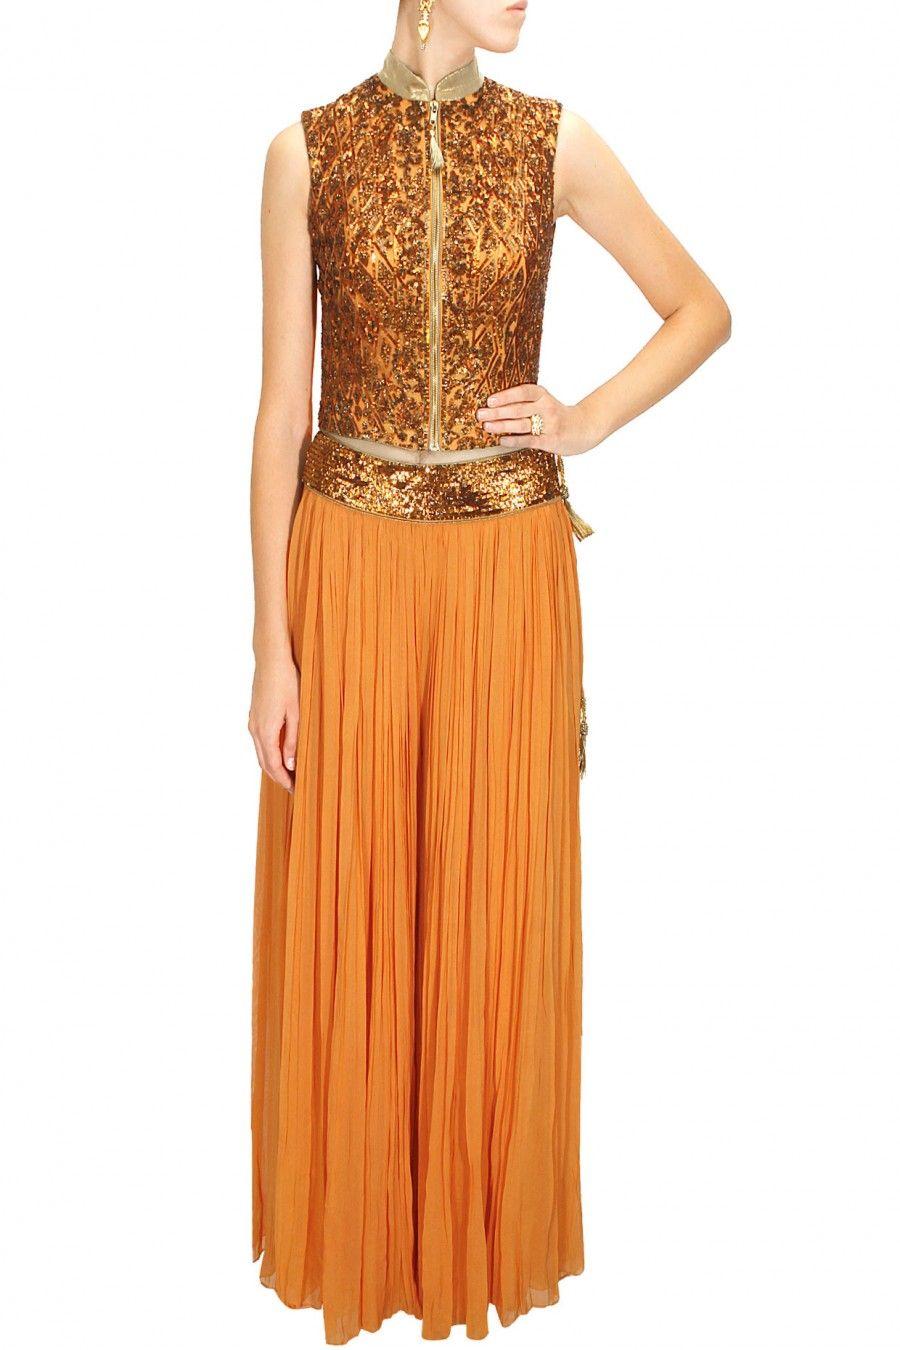 DIVANI Orange palazzo pants with gold sequins blouse | fashion ...